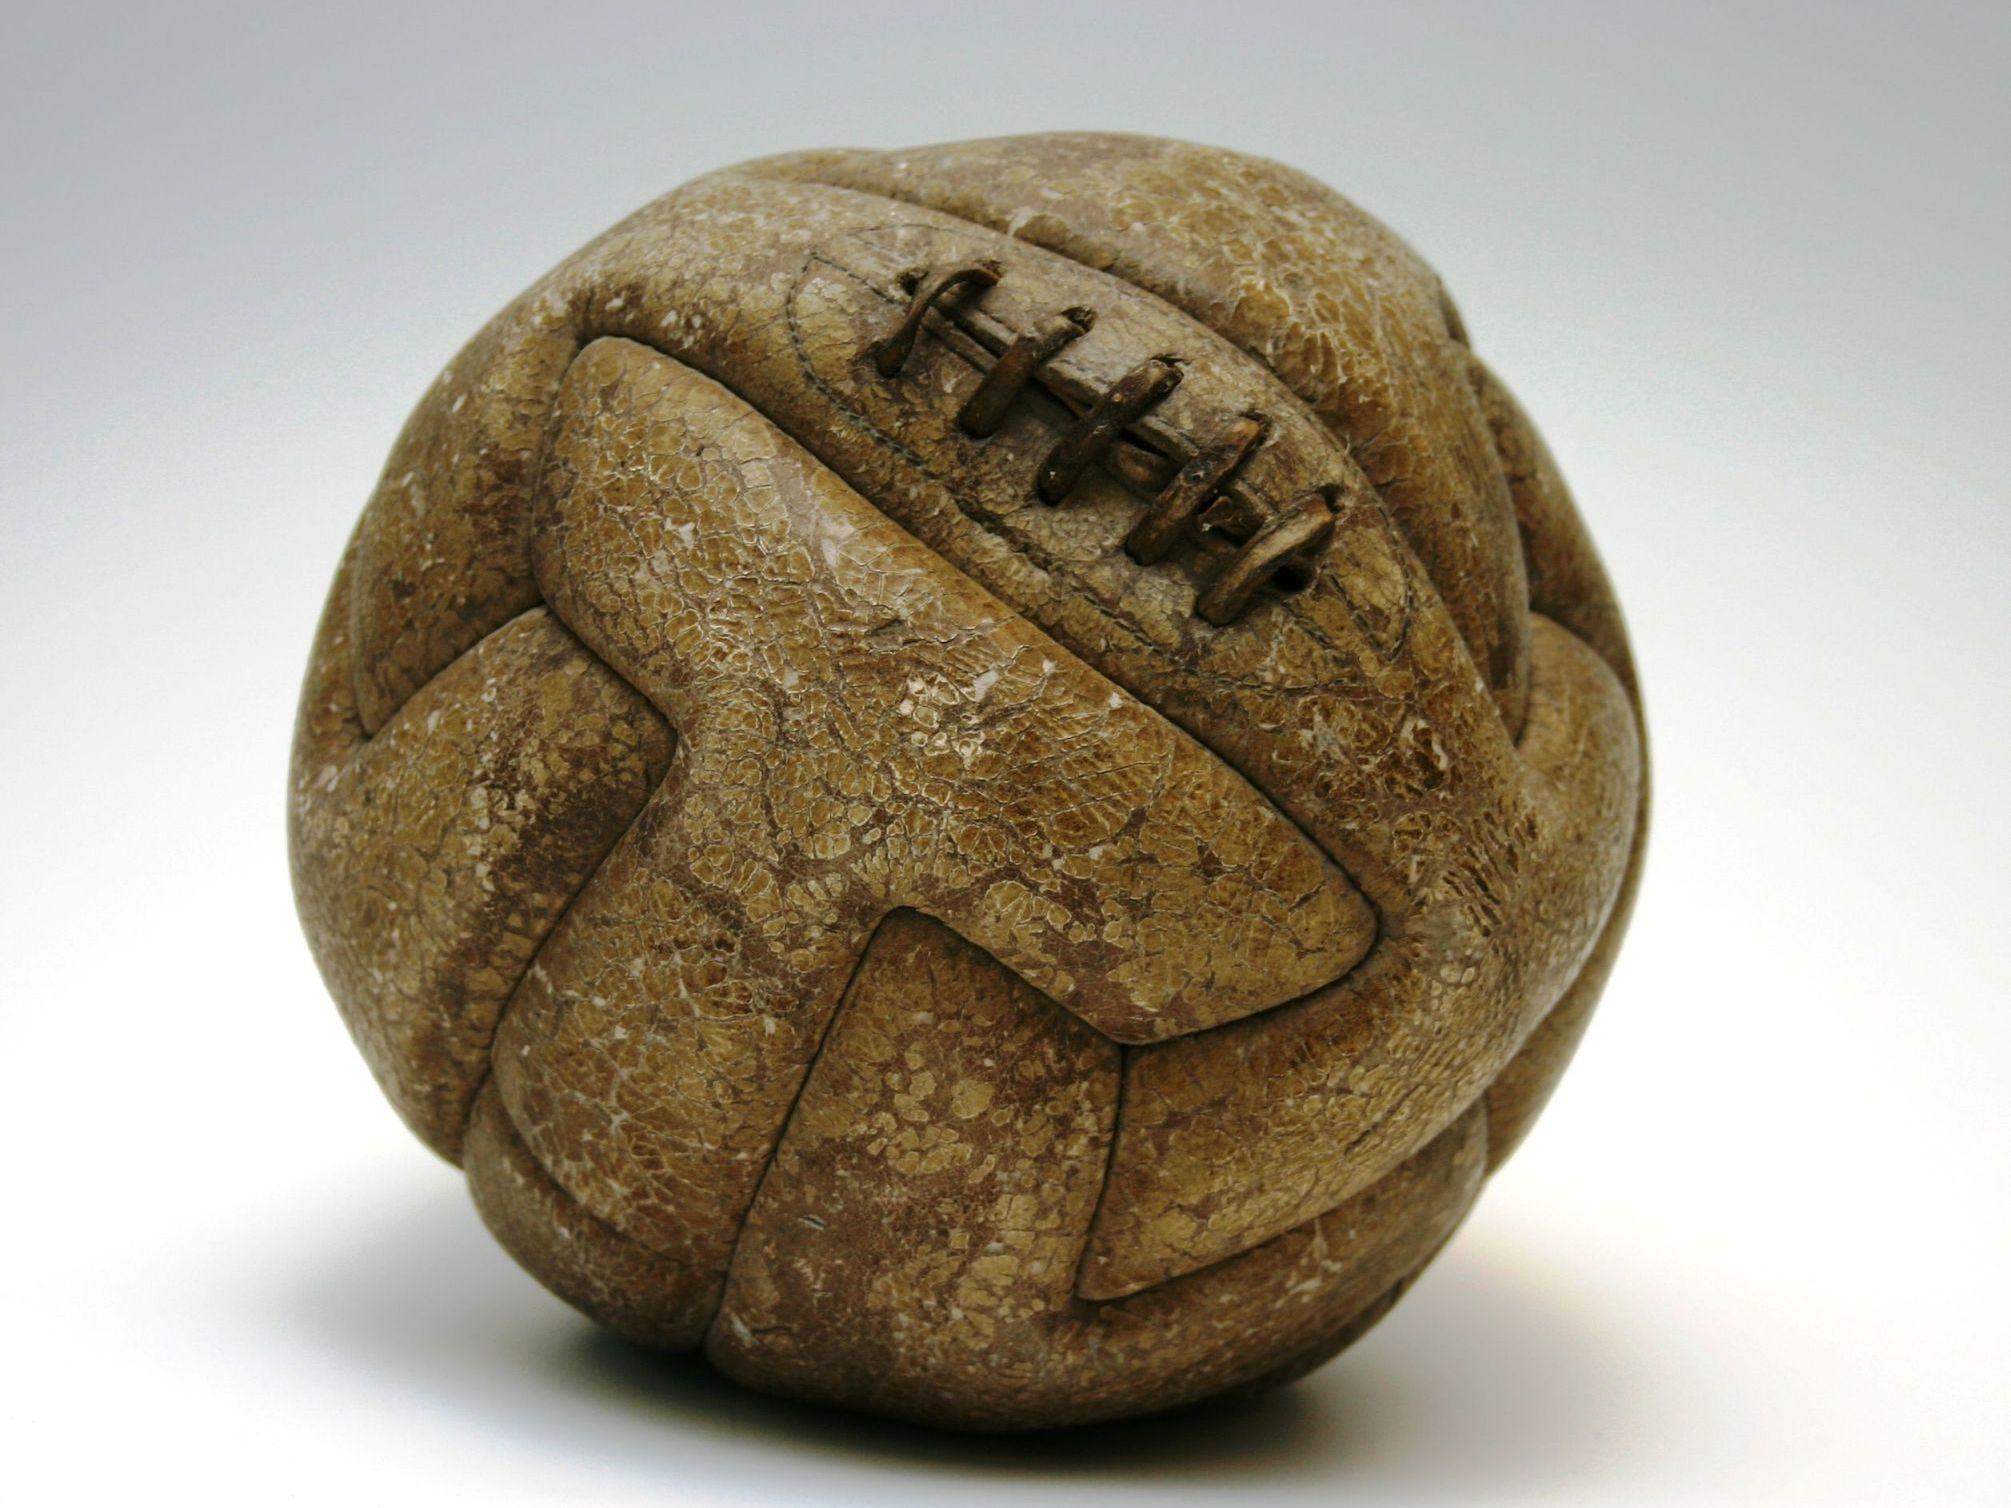 Ballon de la coupe du monde en Uruguay en 1930 © National Museum of Football, Manchester